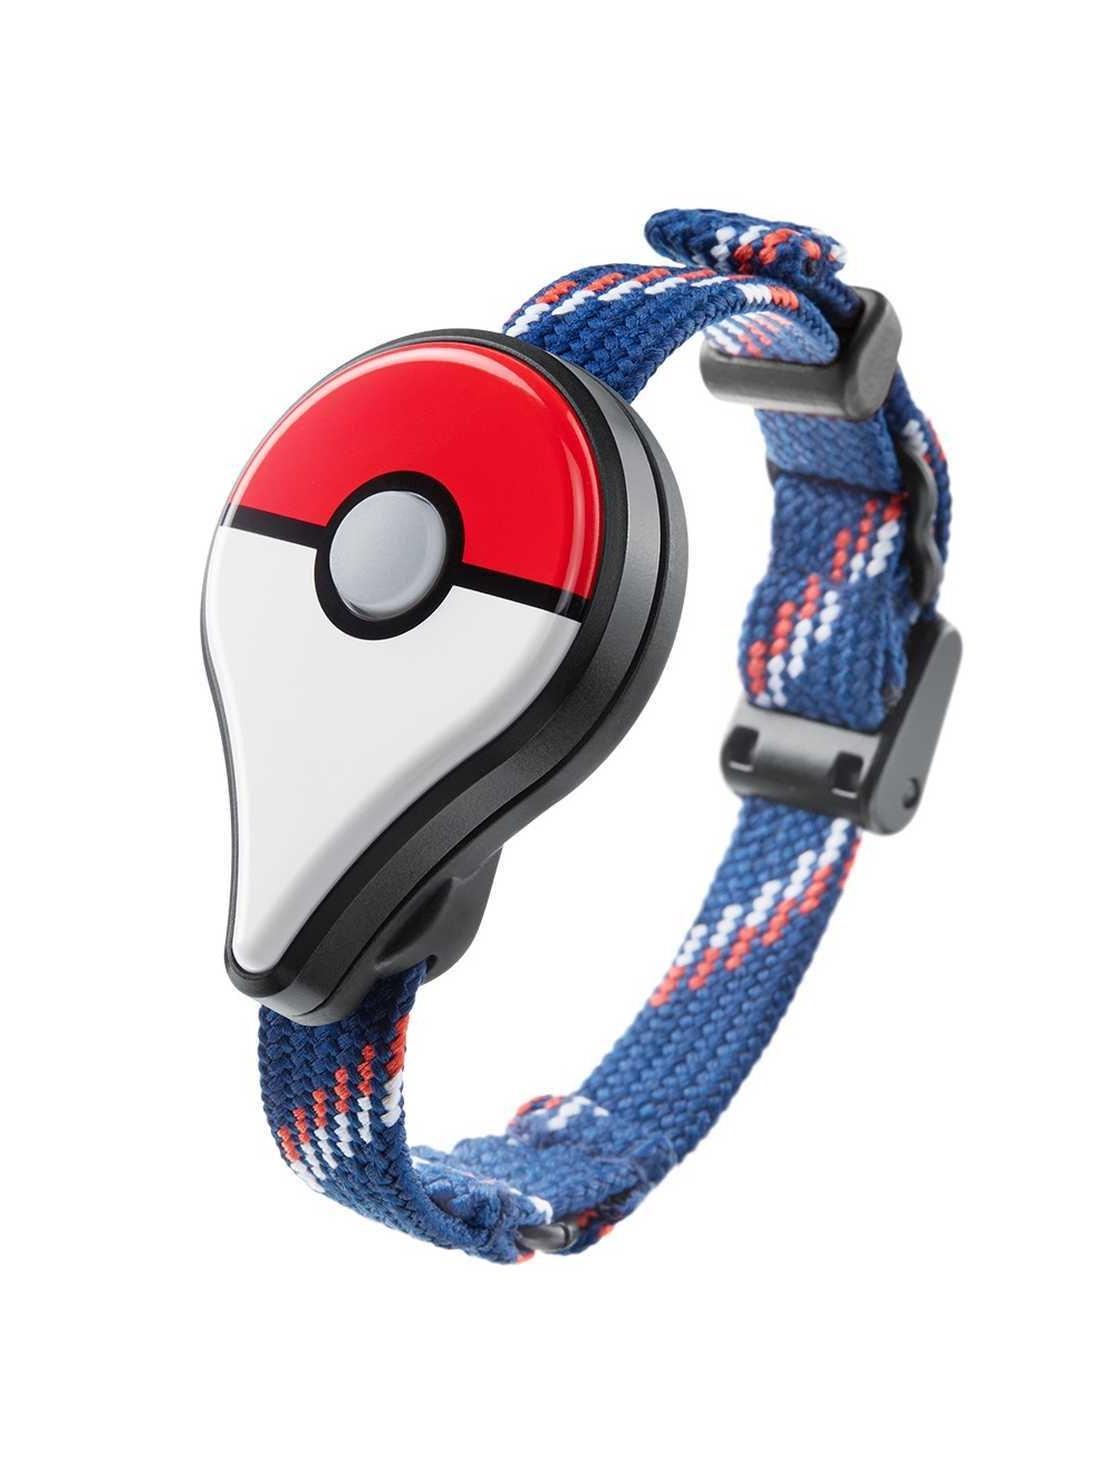 The Wristband